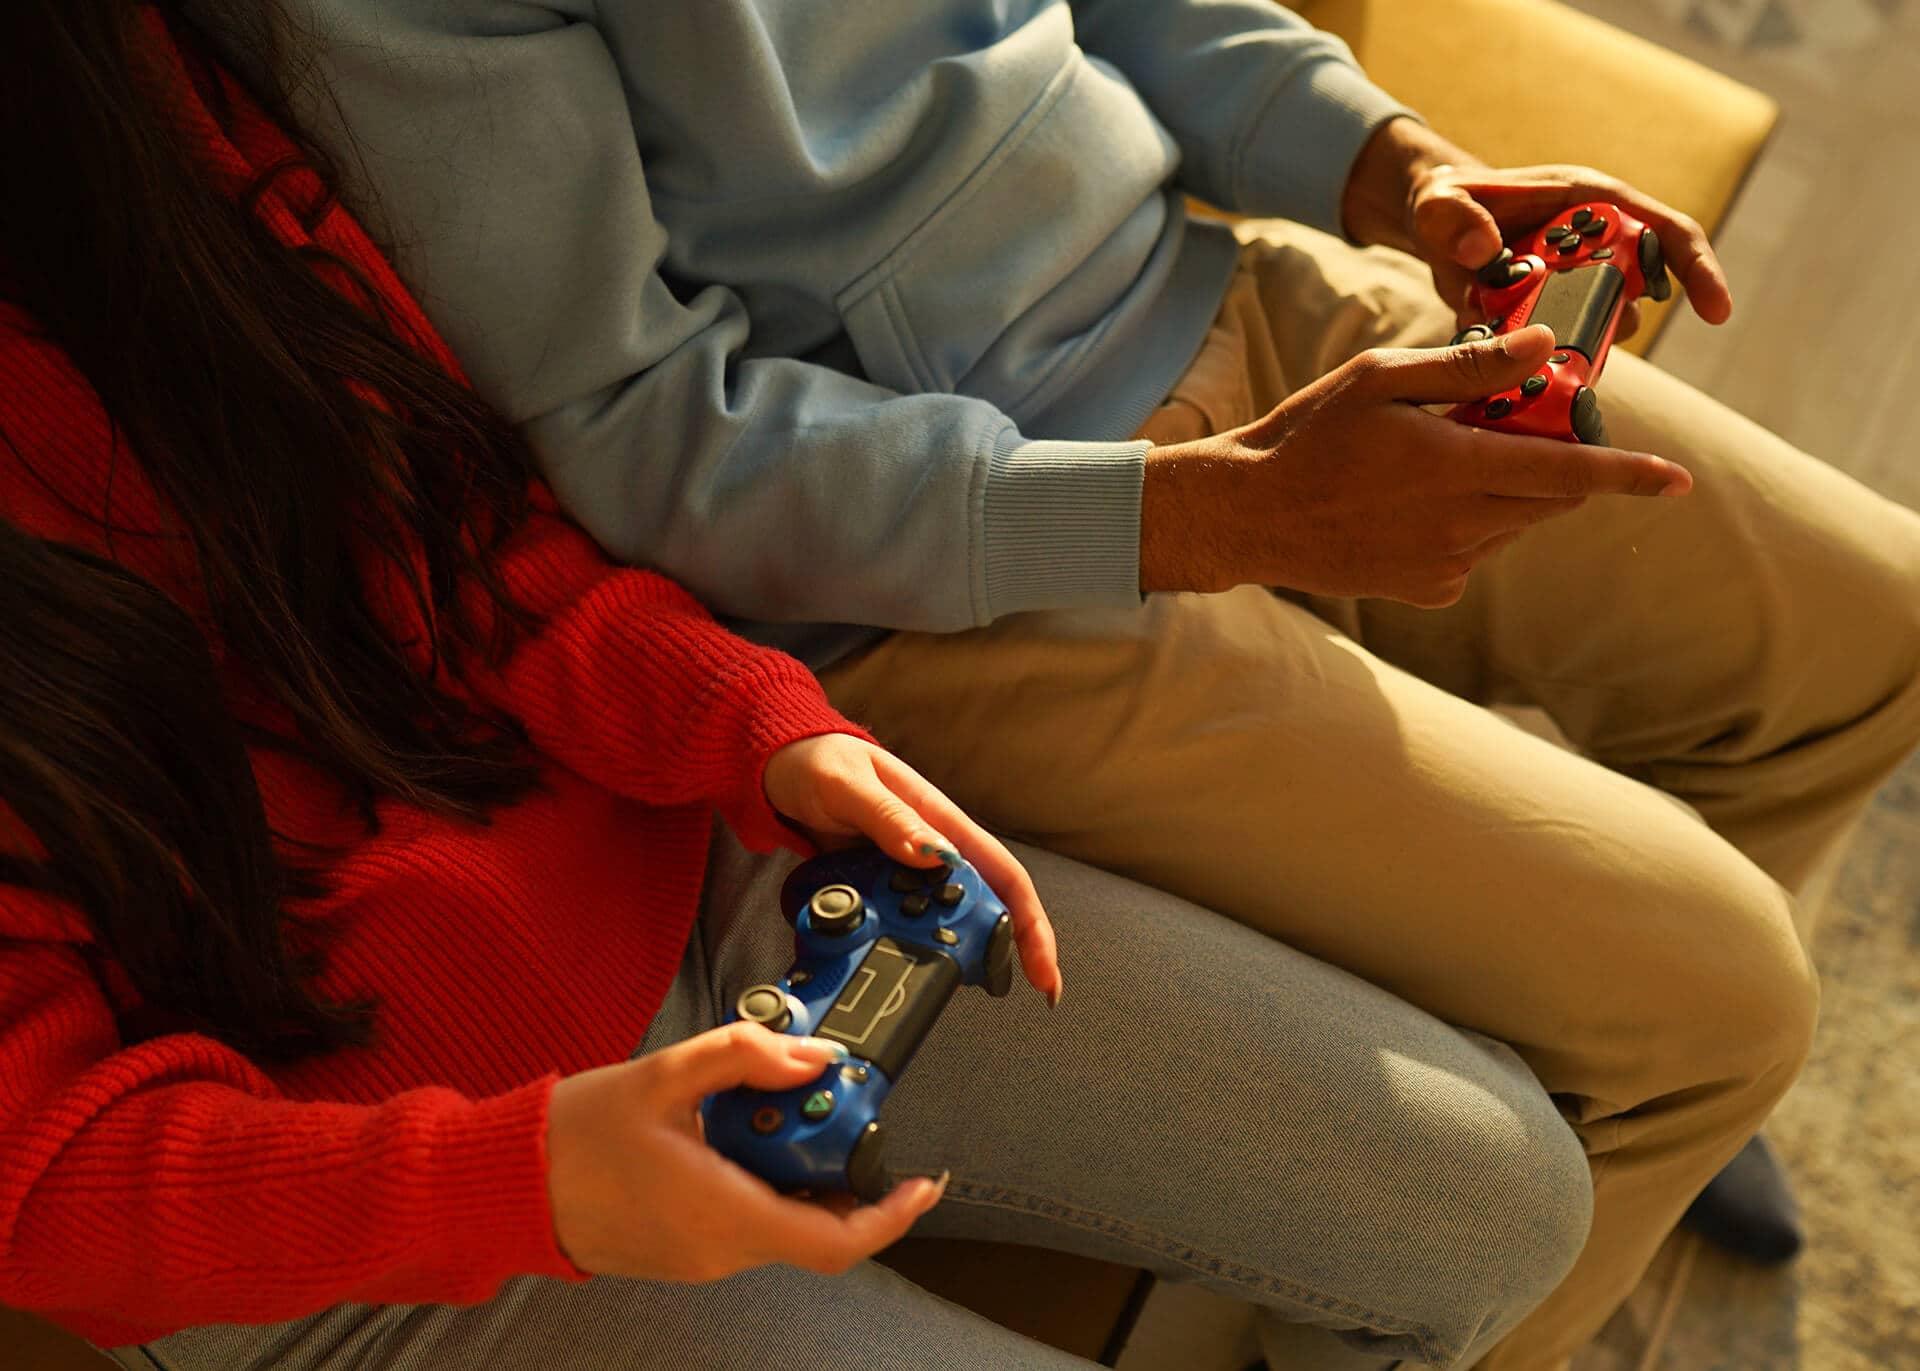 girl and guy gaming